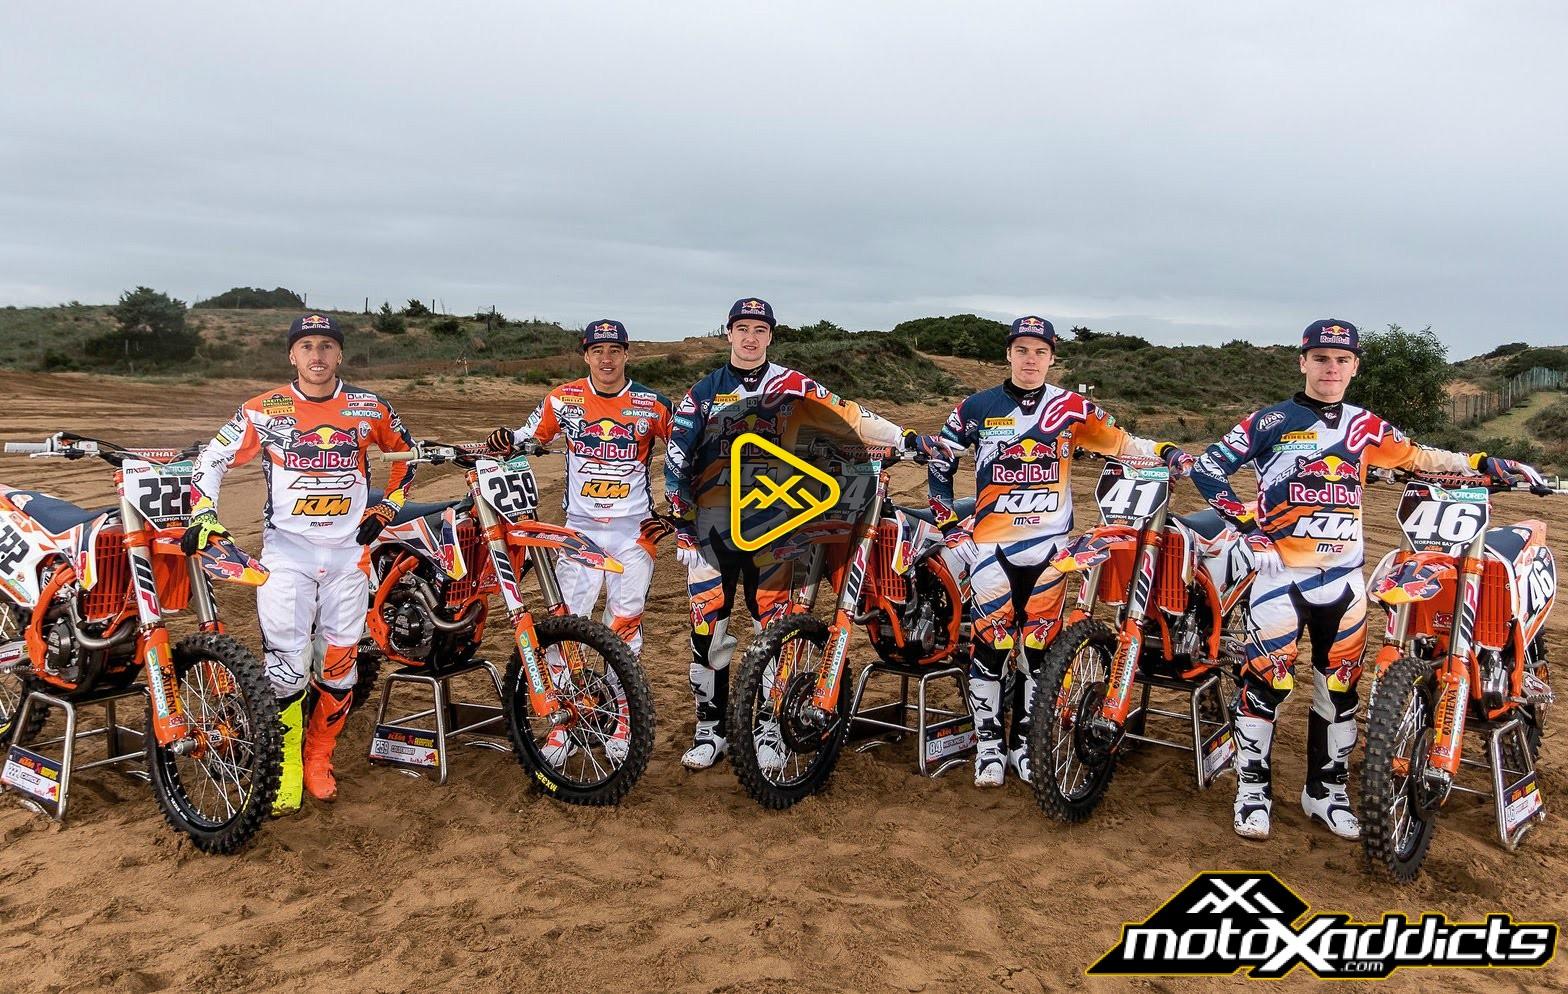 2016 Red Bull/KTM MXGP and MX2 Team Photoshoot